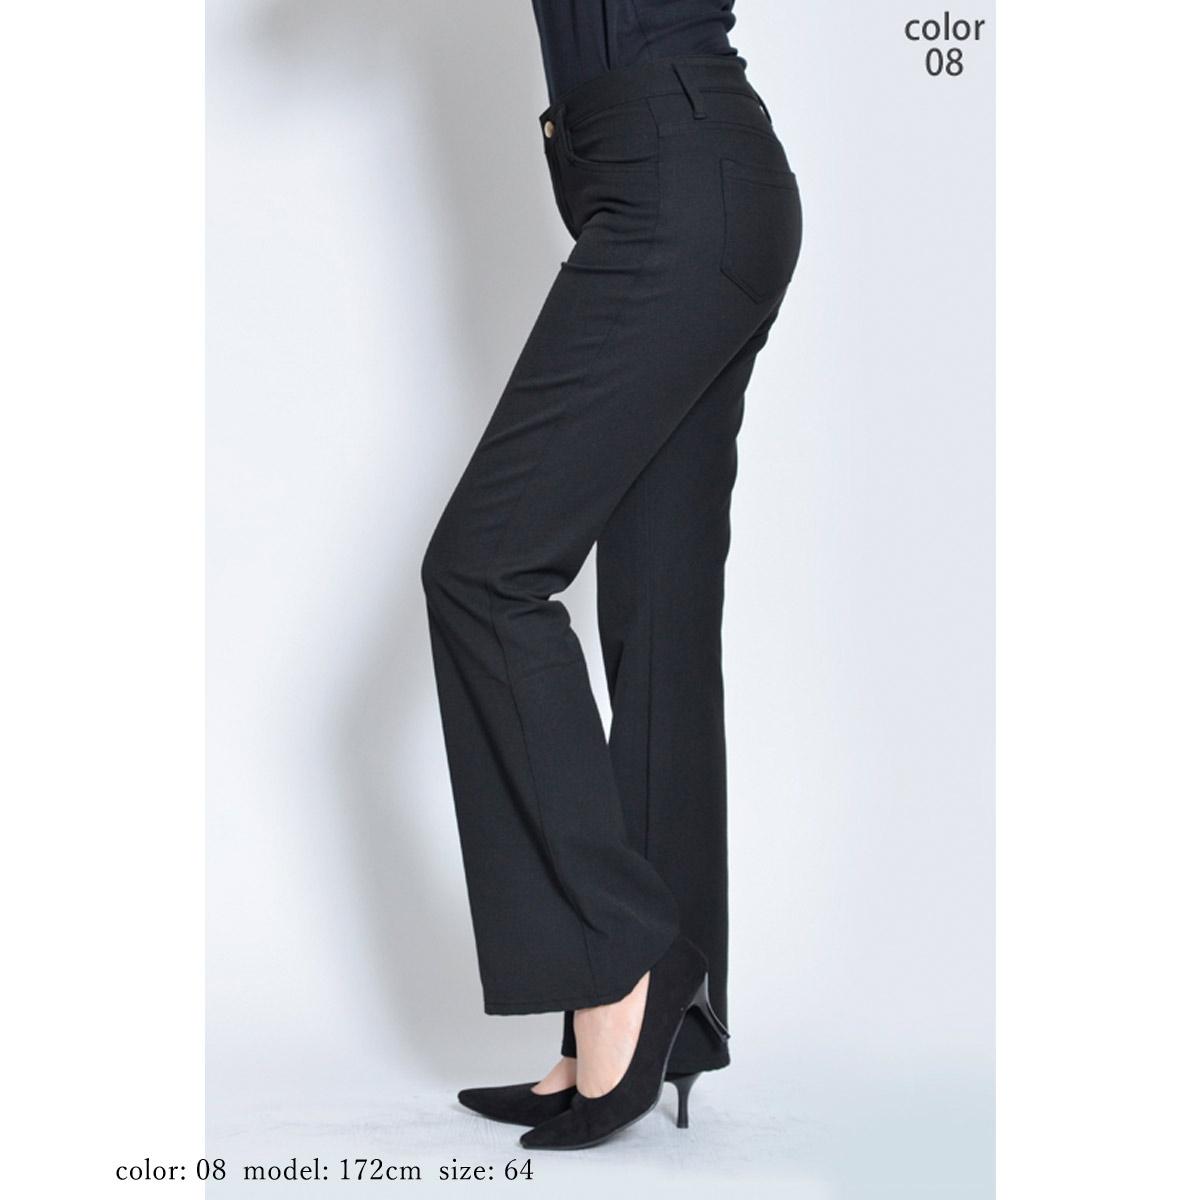 【SALE】Mrs.Jeana スレンダー MJ4323